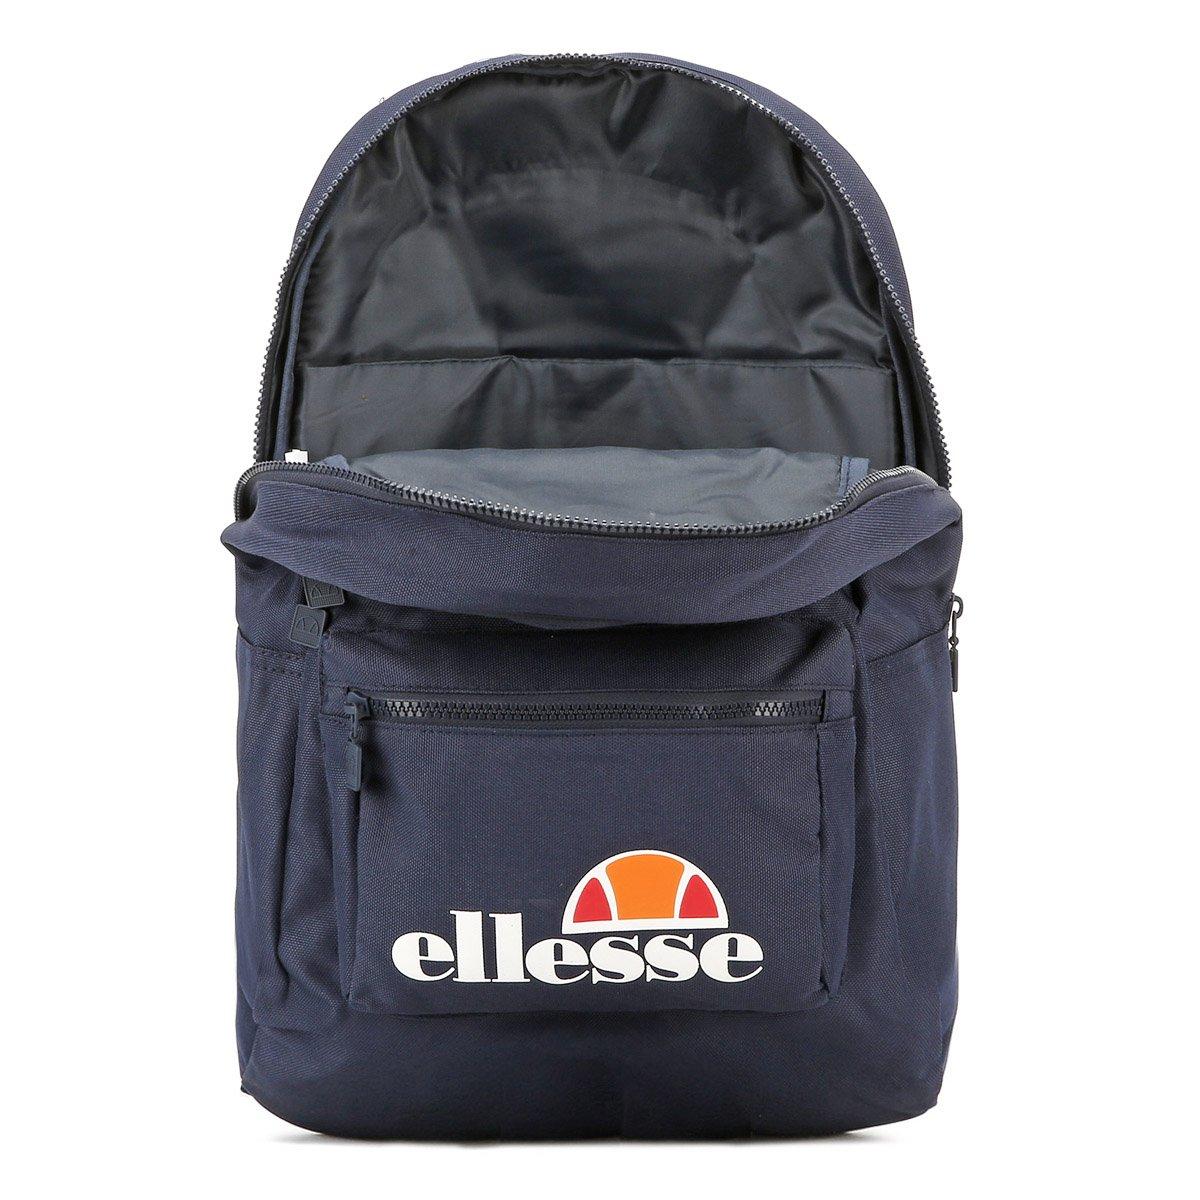 ELLESSE Fabia Backpack Navy School Bag SHAU0283 - ELLESSE Bags  Amazon.co.uk   Luggage d505fc34f4de9